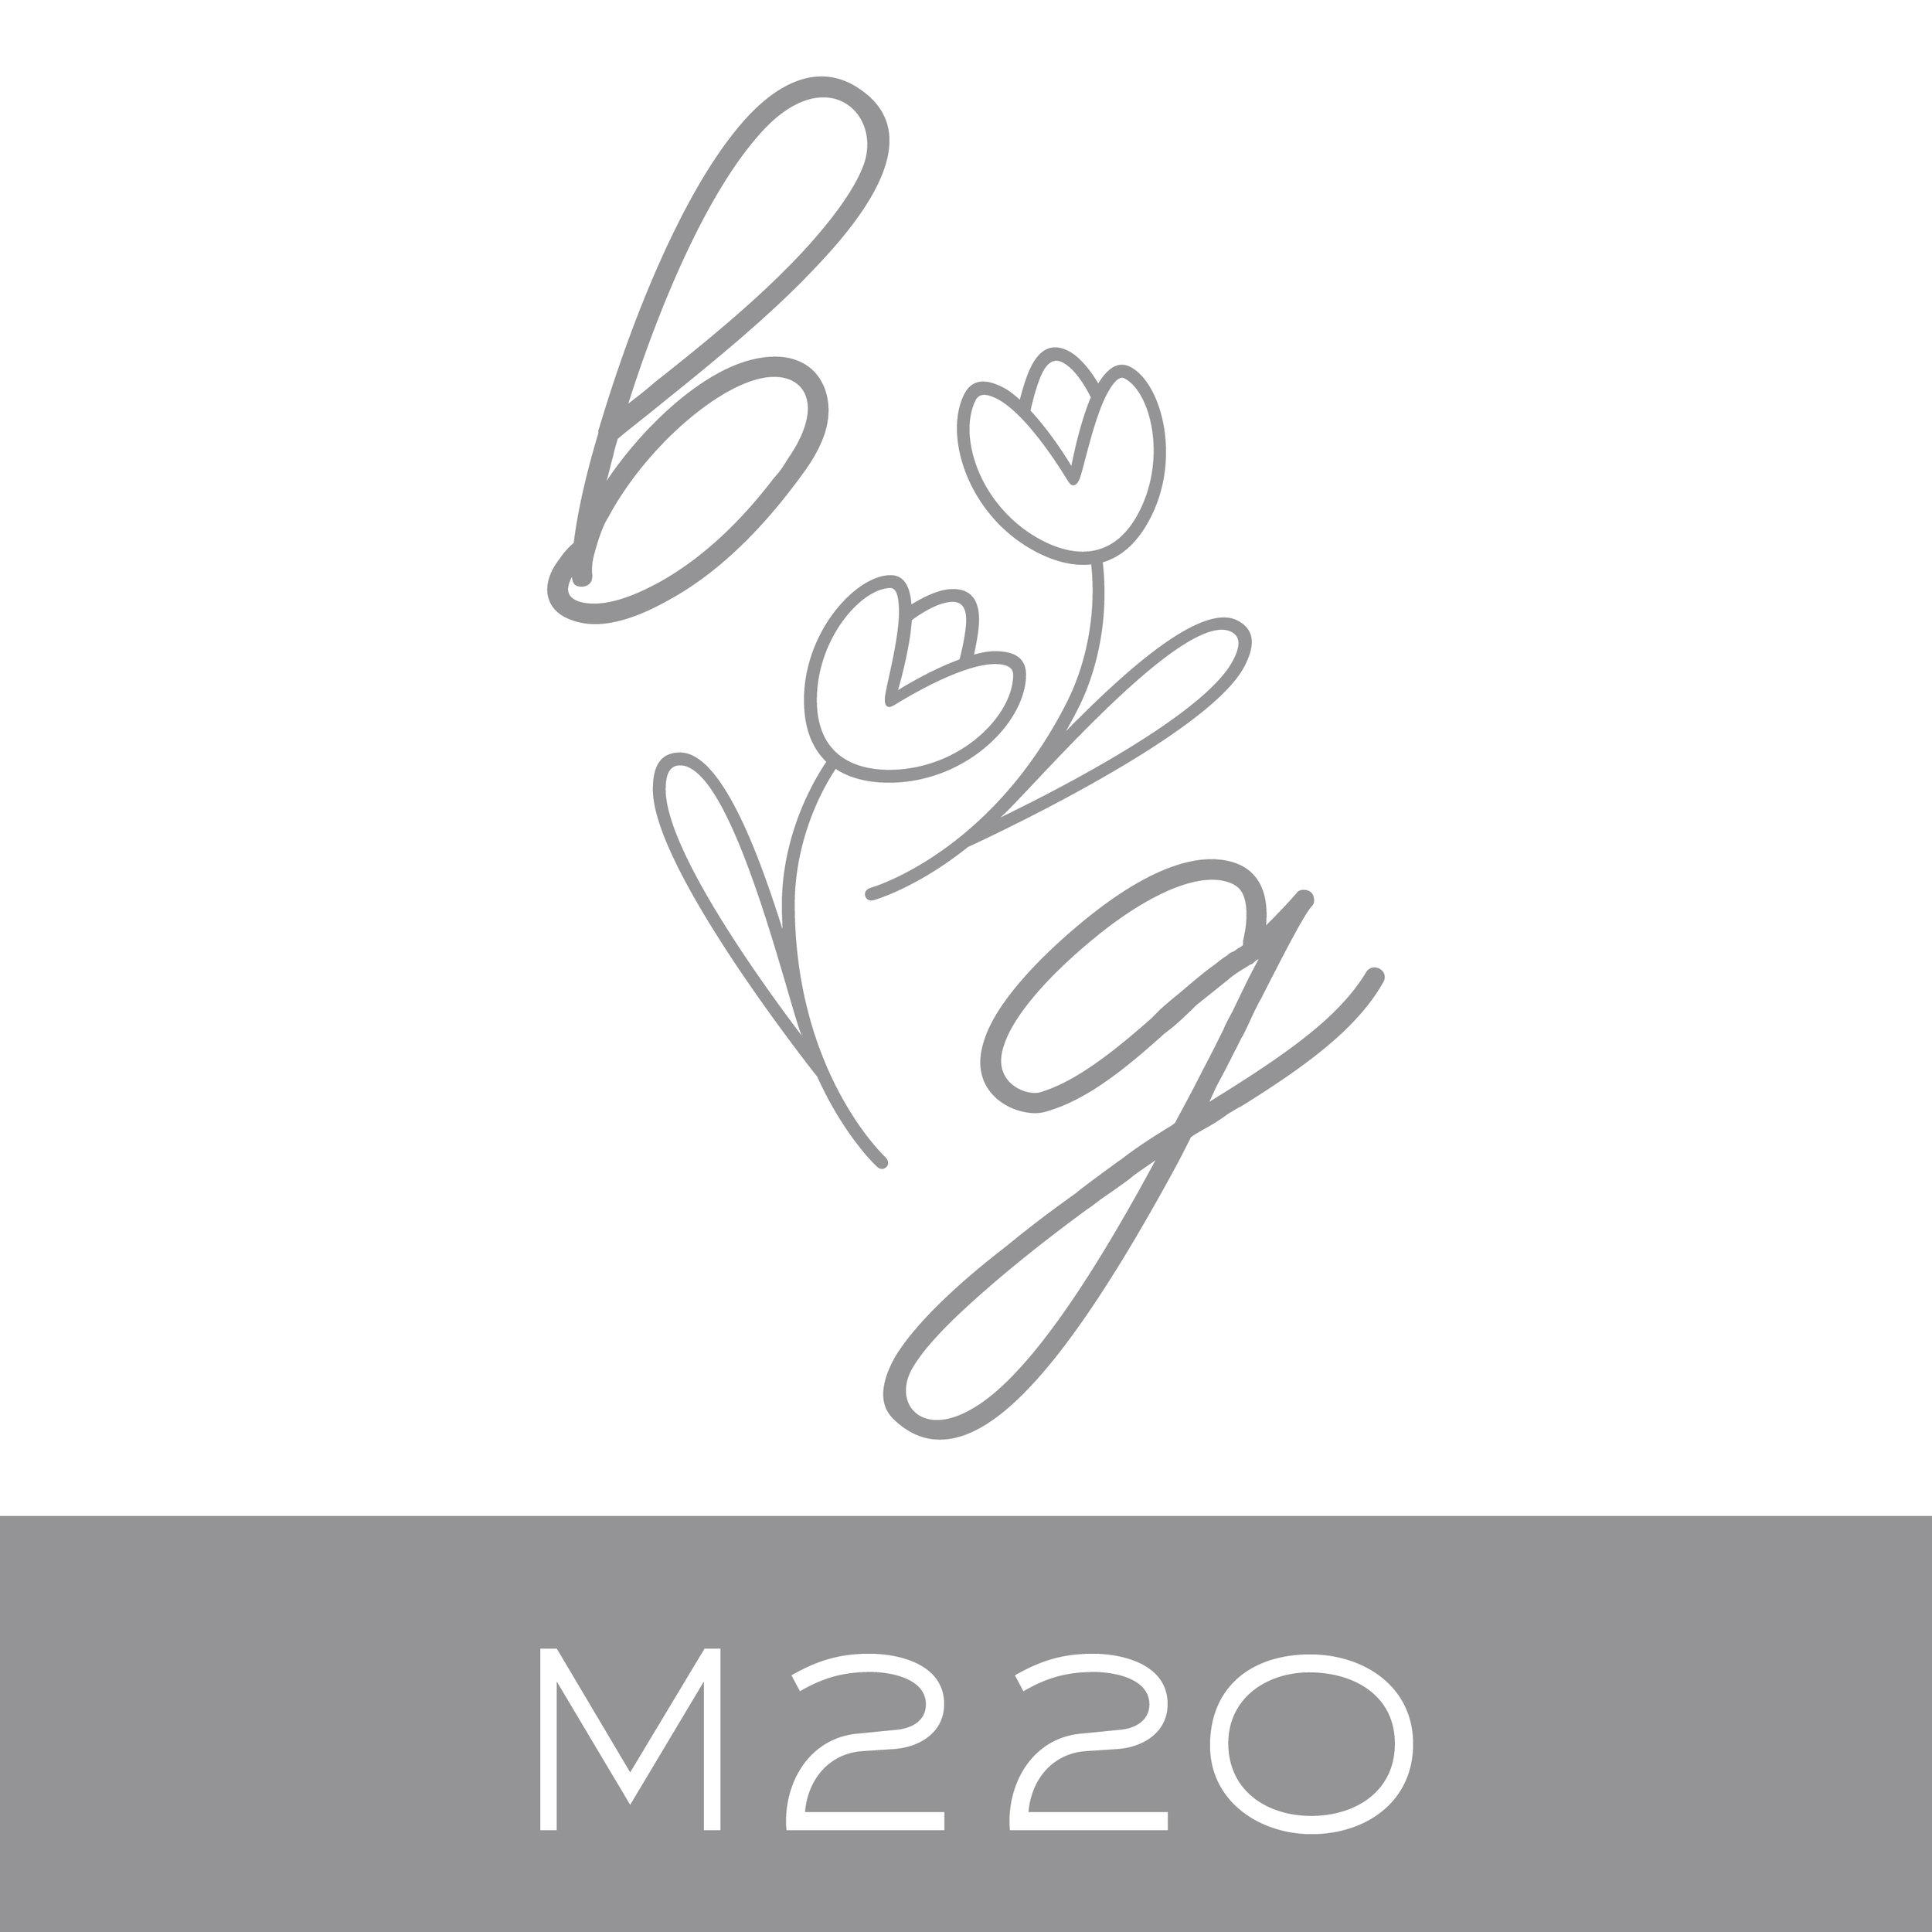 M220.jpg